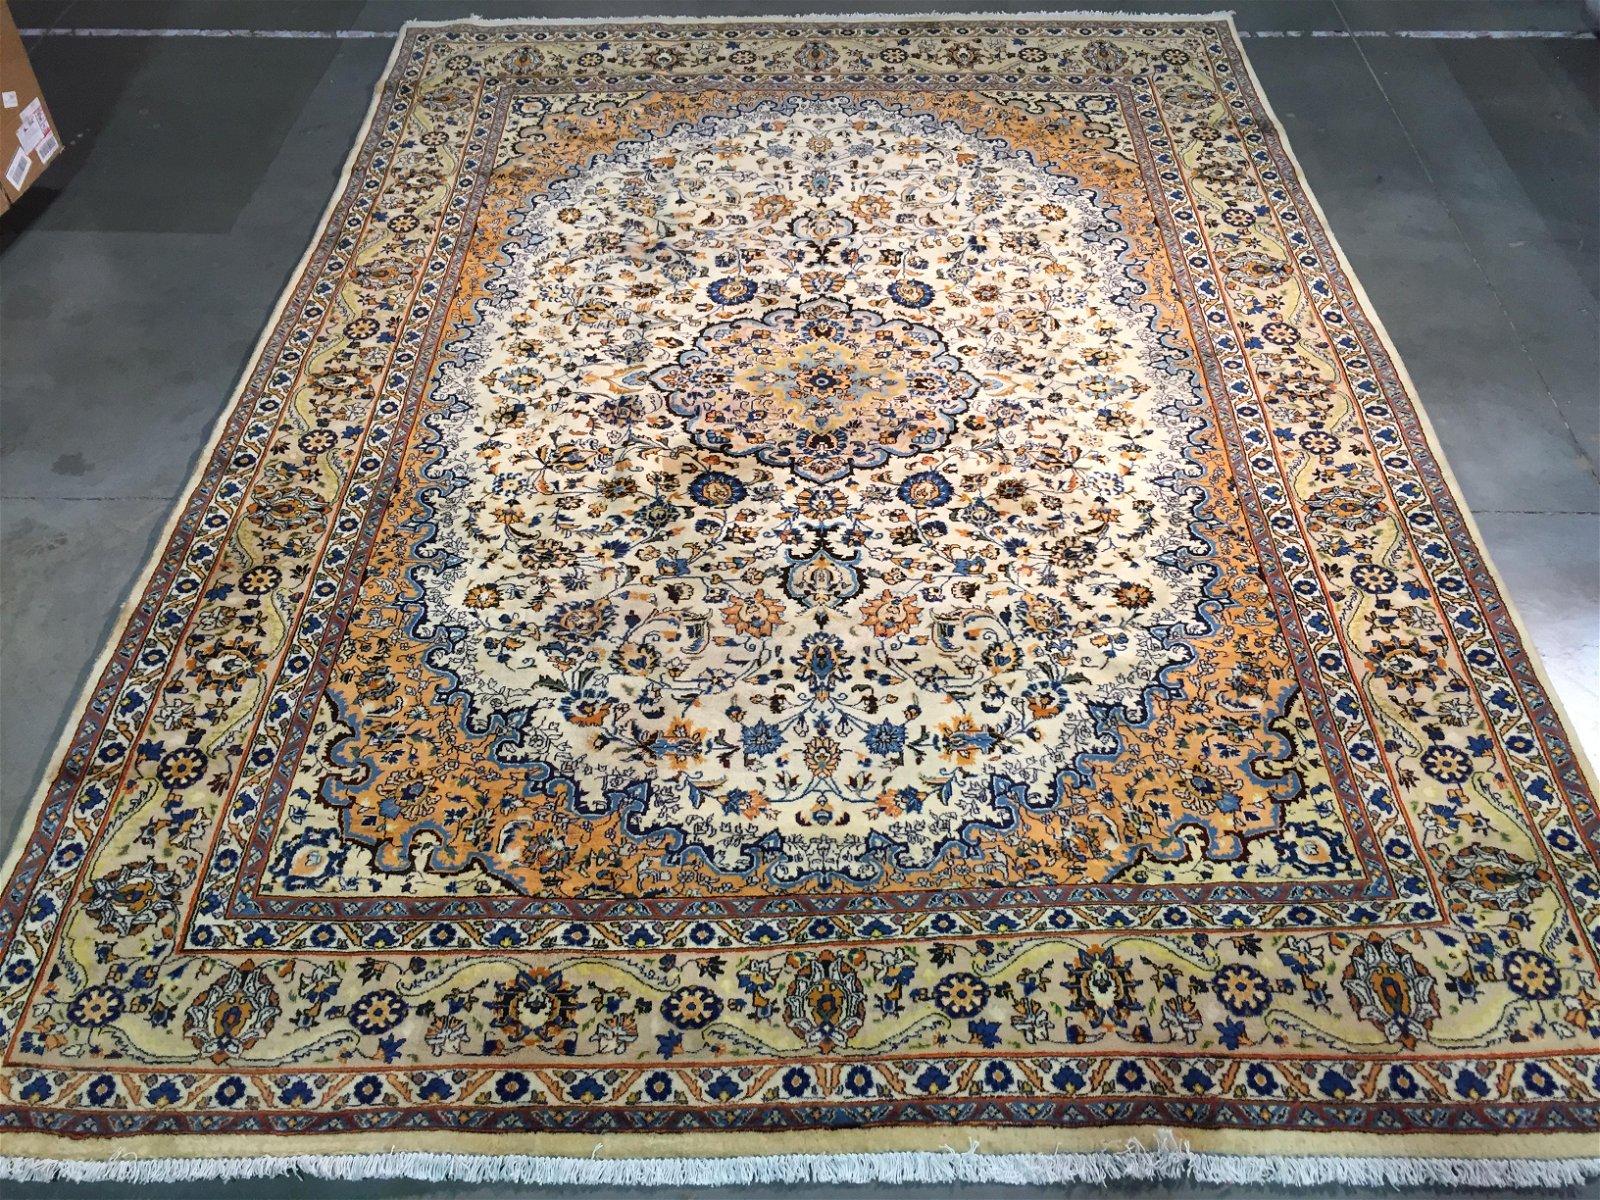 STUNNING AUTHENTIC PERSIAN KASHMAR RUG 9.5x13